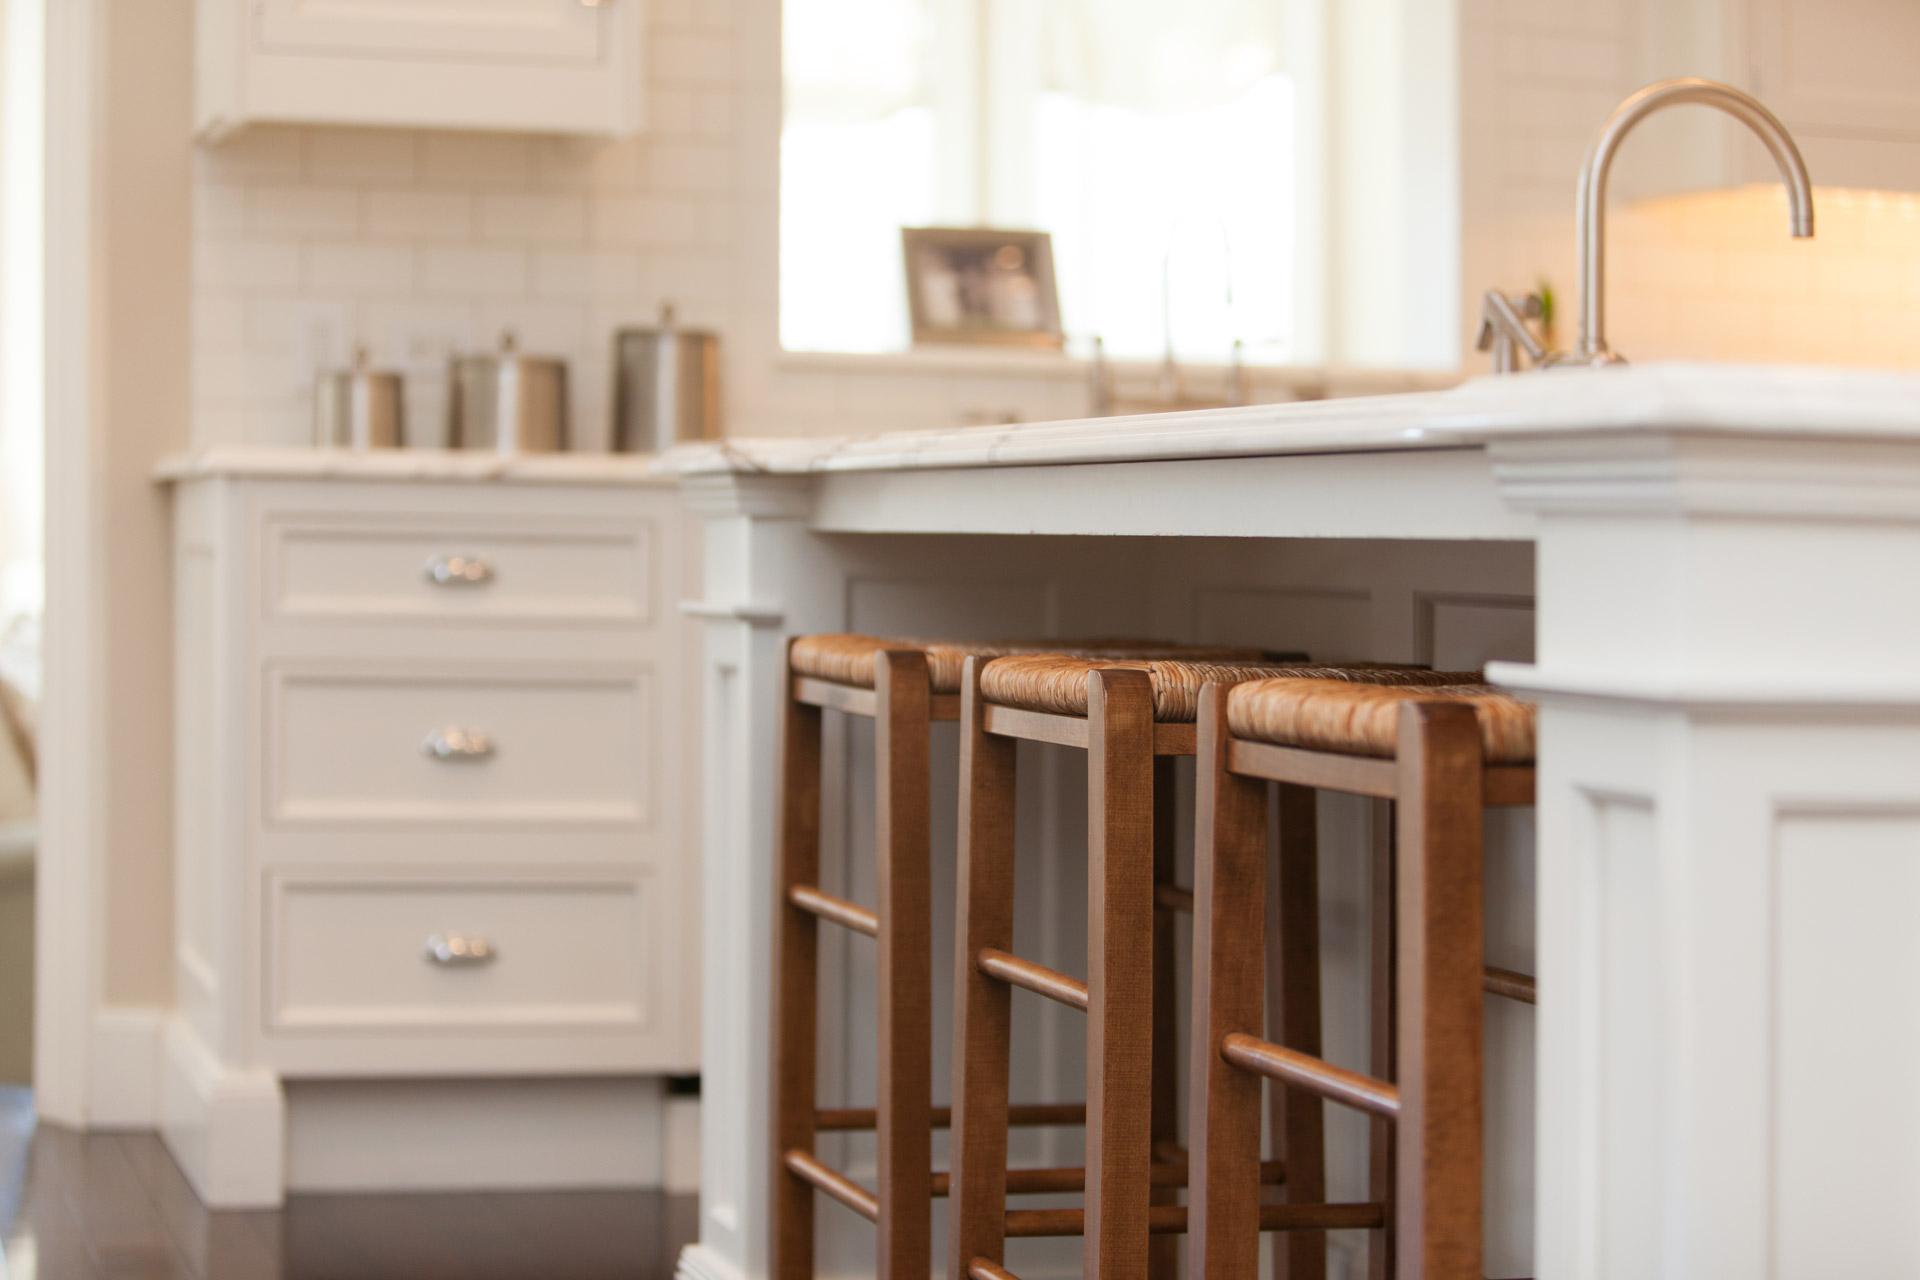 Kitchen breakfast bar stools country farmhouse